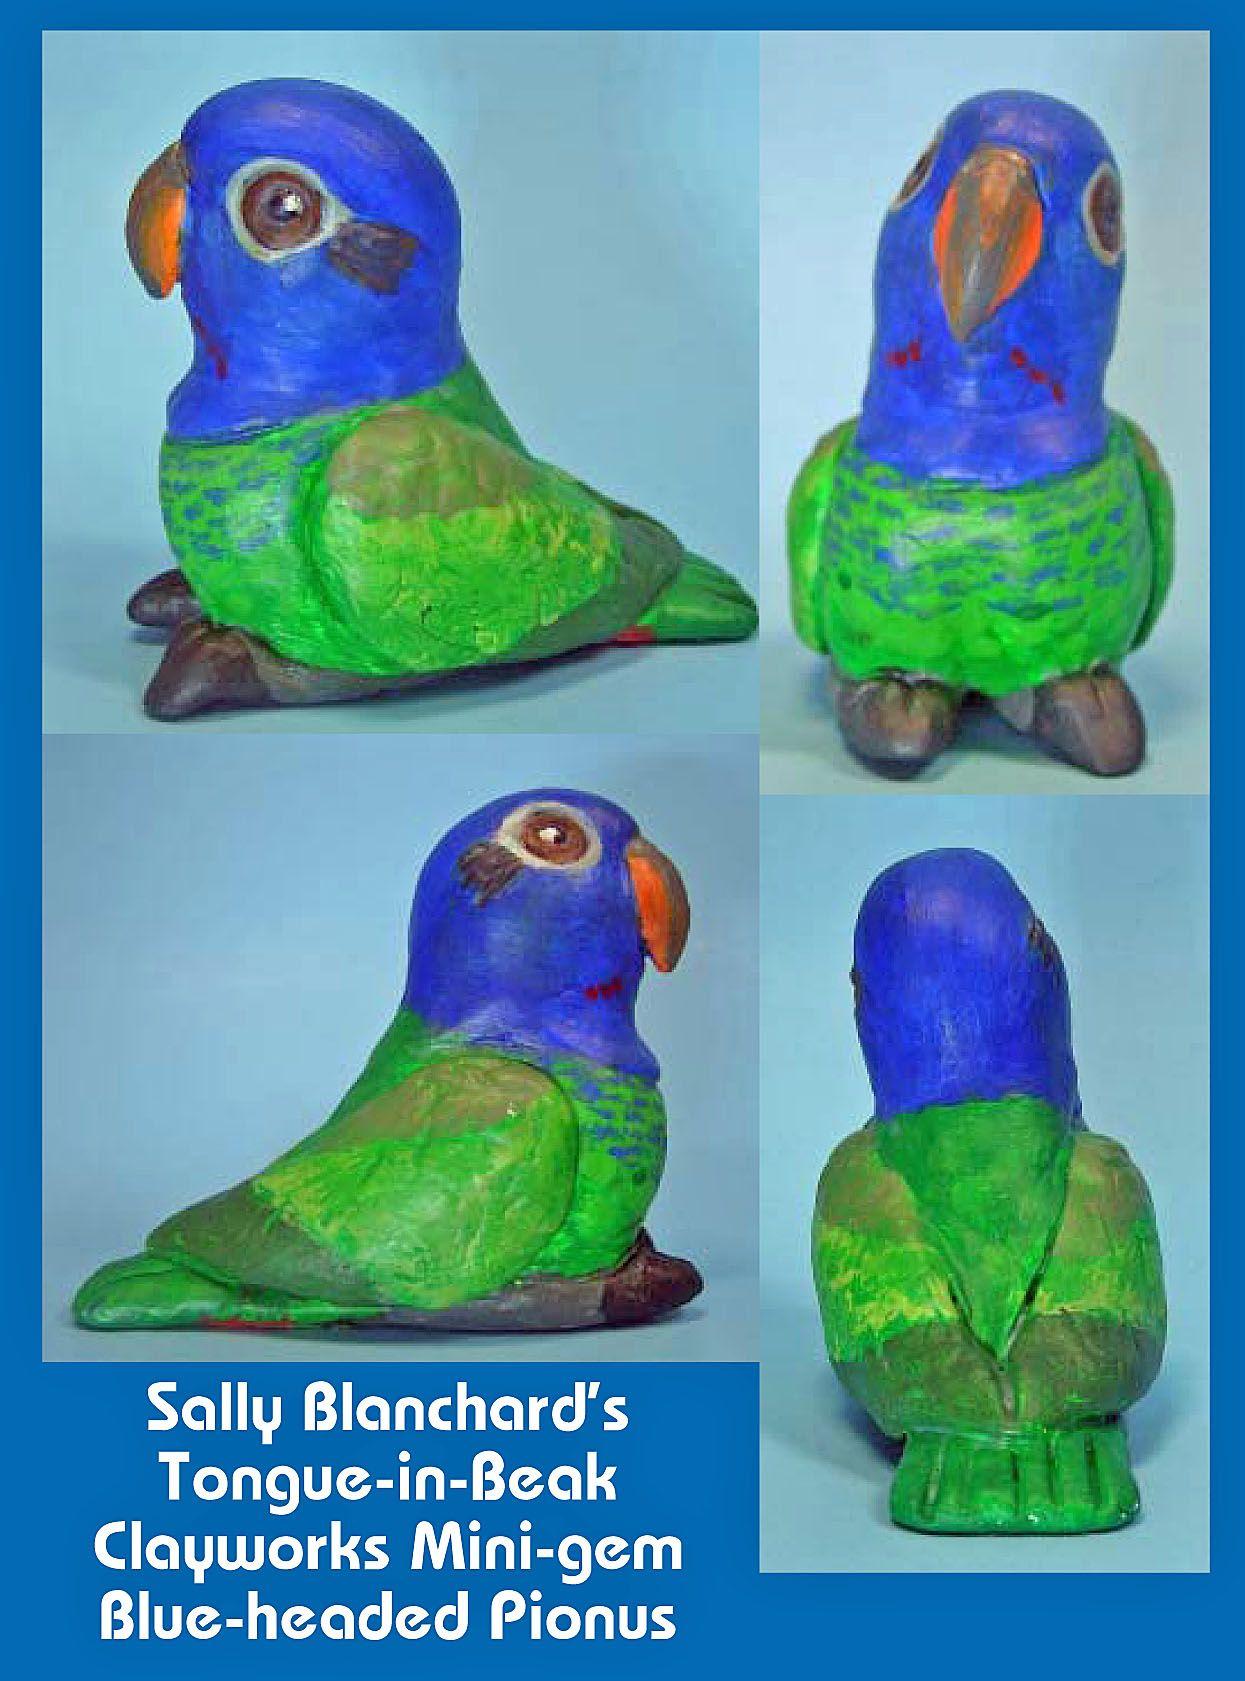 Blue-headed Pionus Mini-gem Available